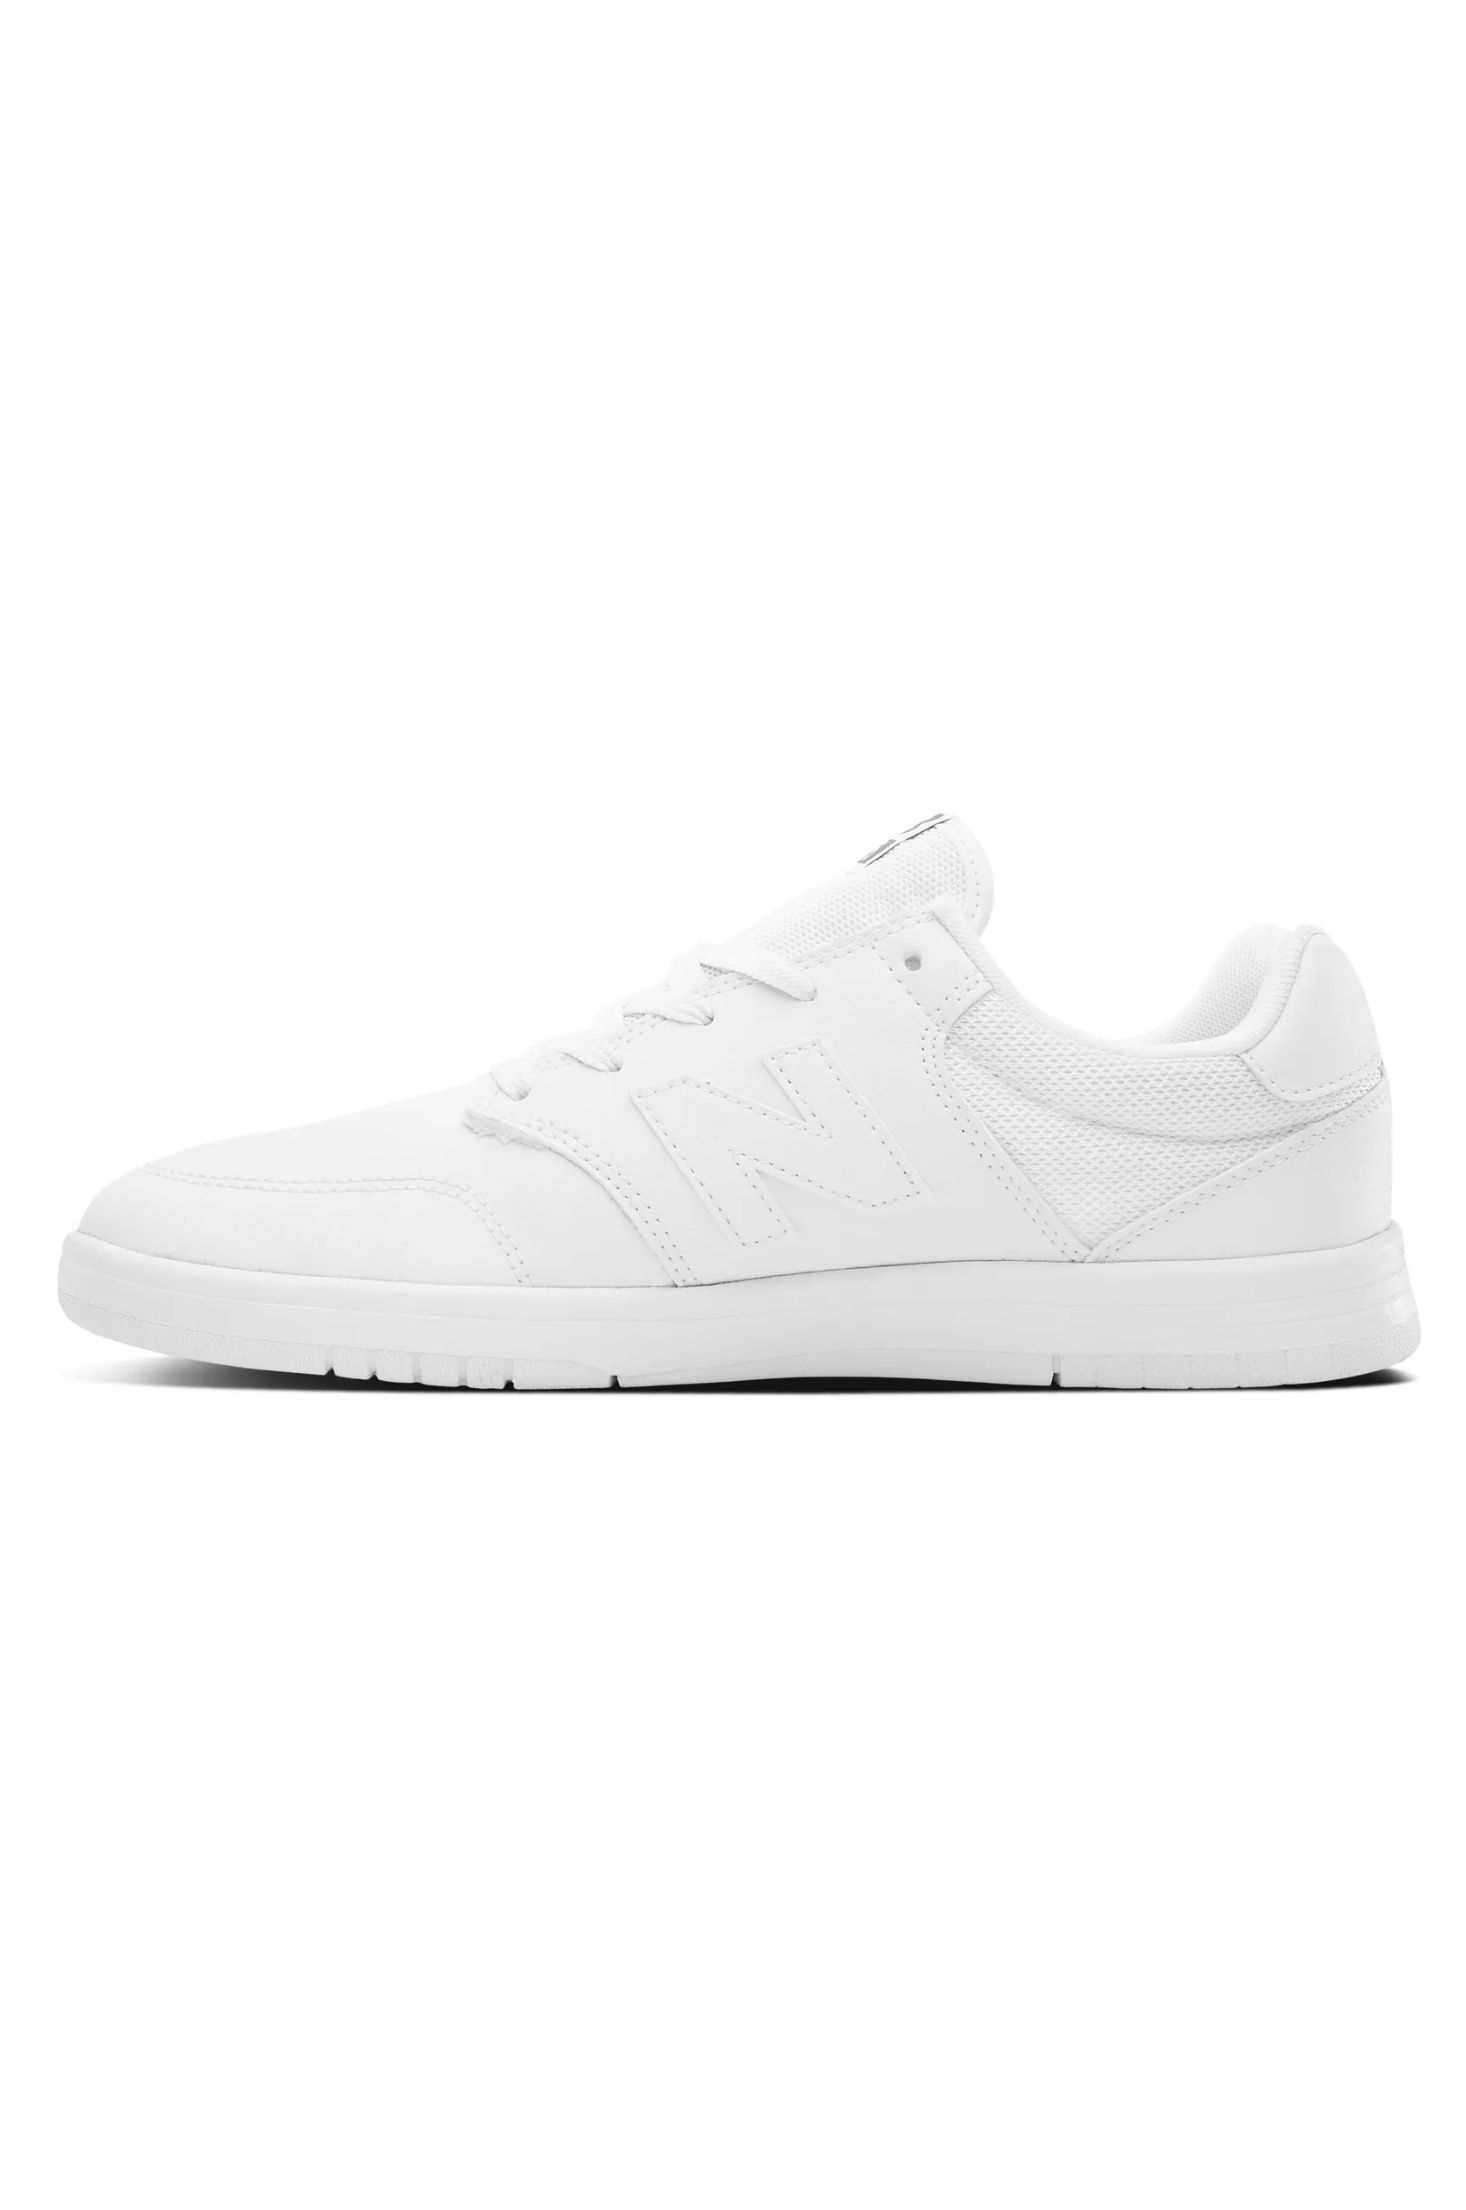 Tenis New Balance AM425 White